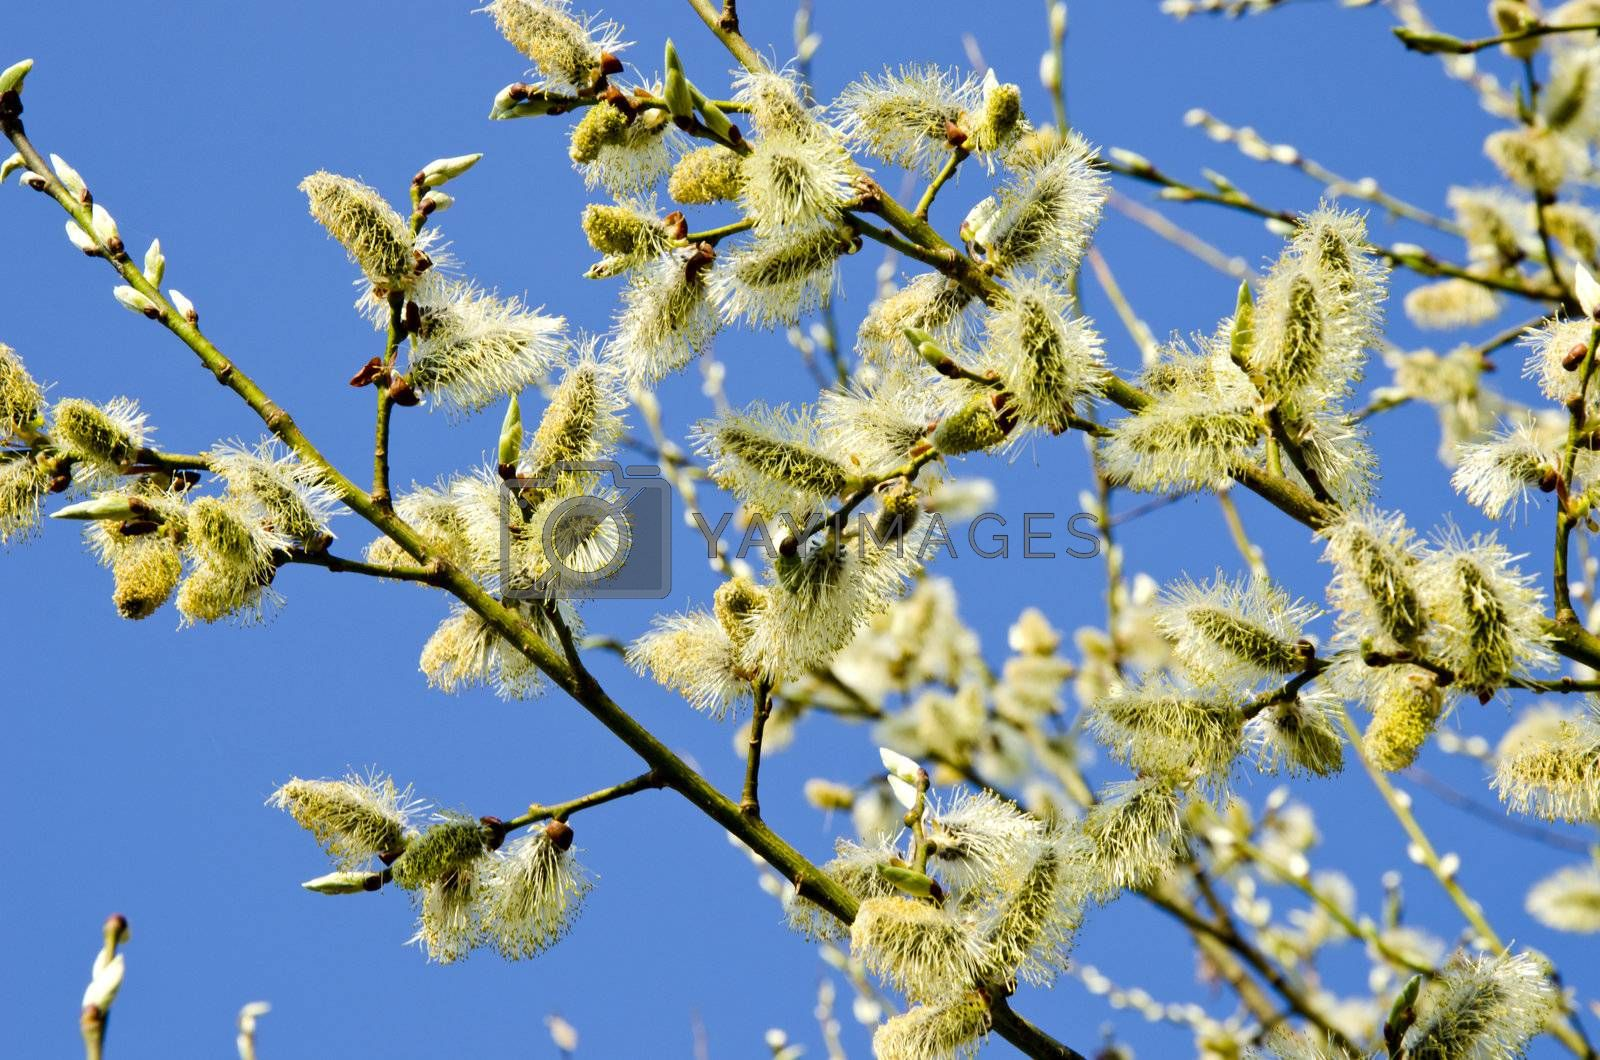 kittens in spring blooming tree branch blue sky.